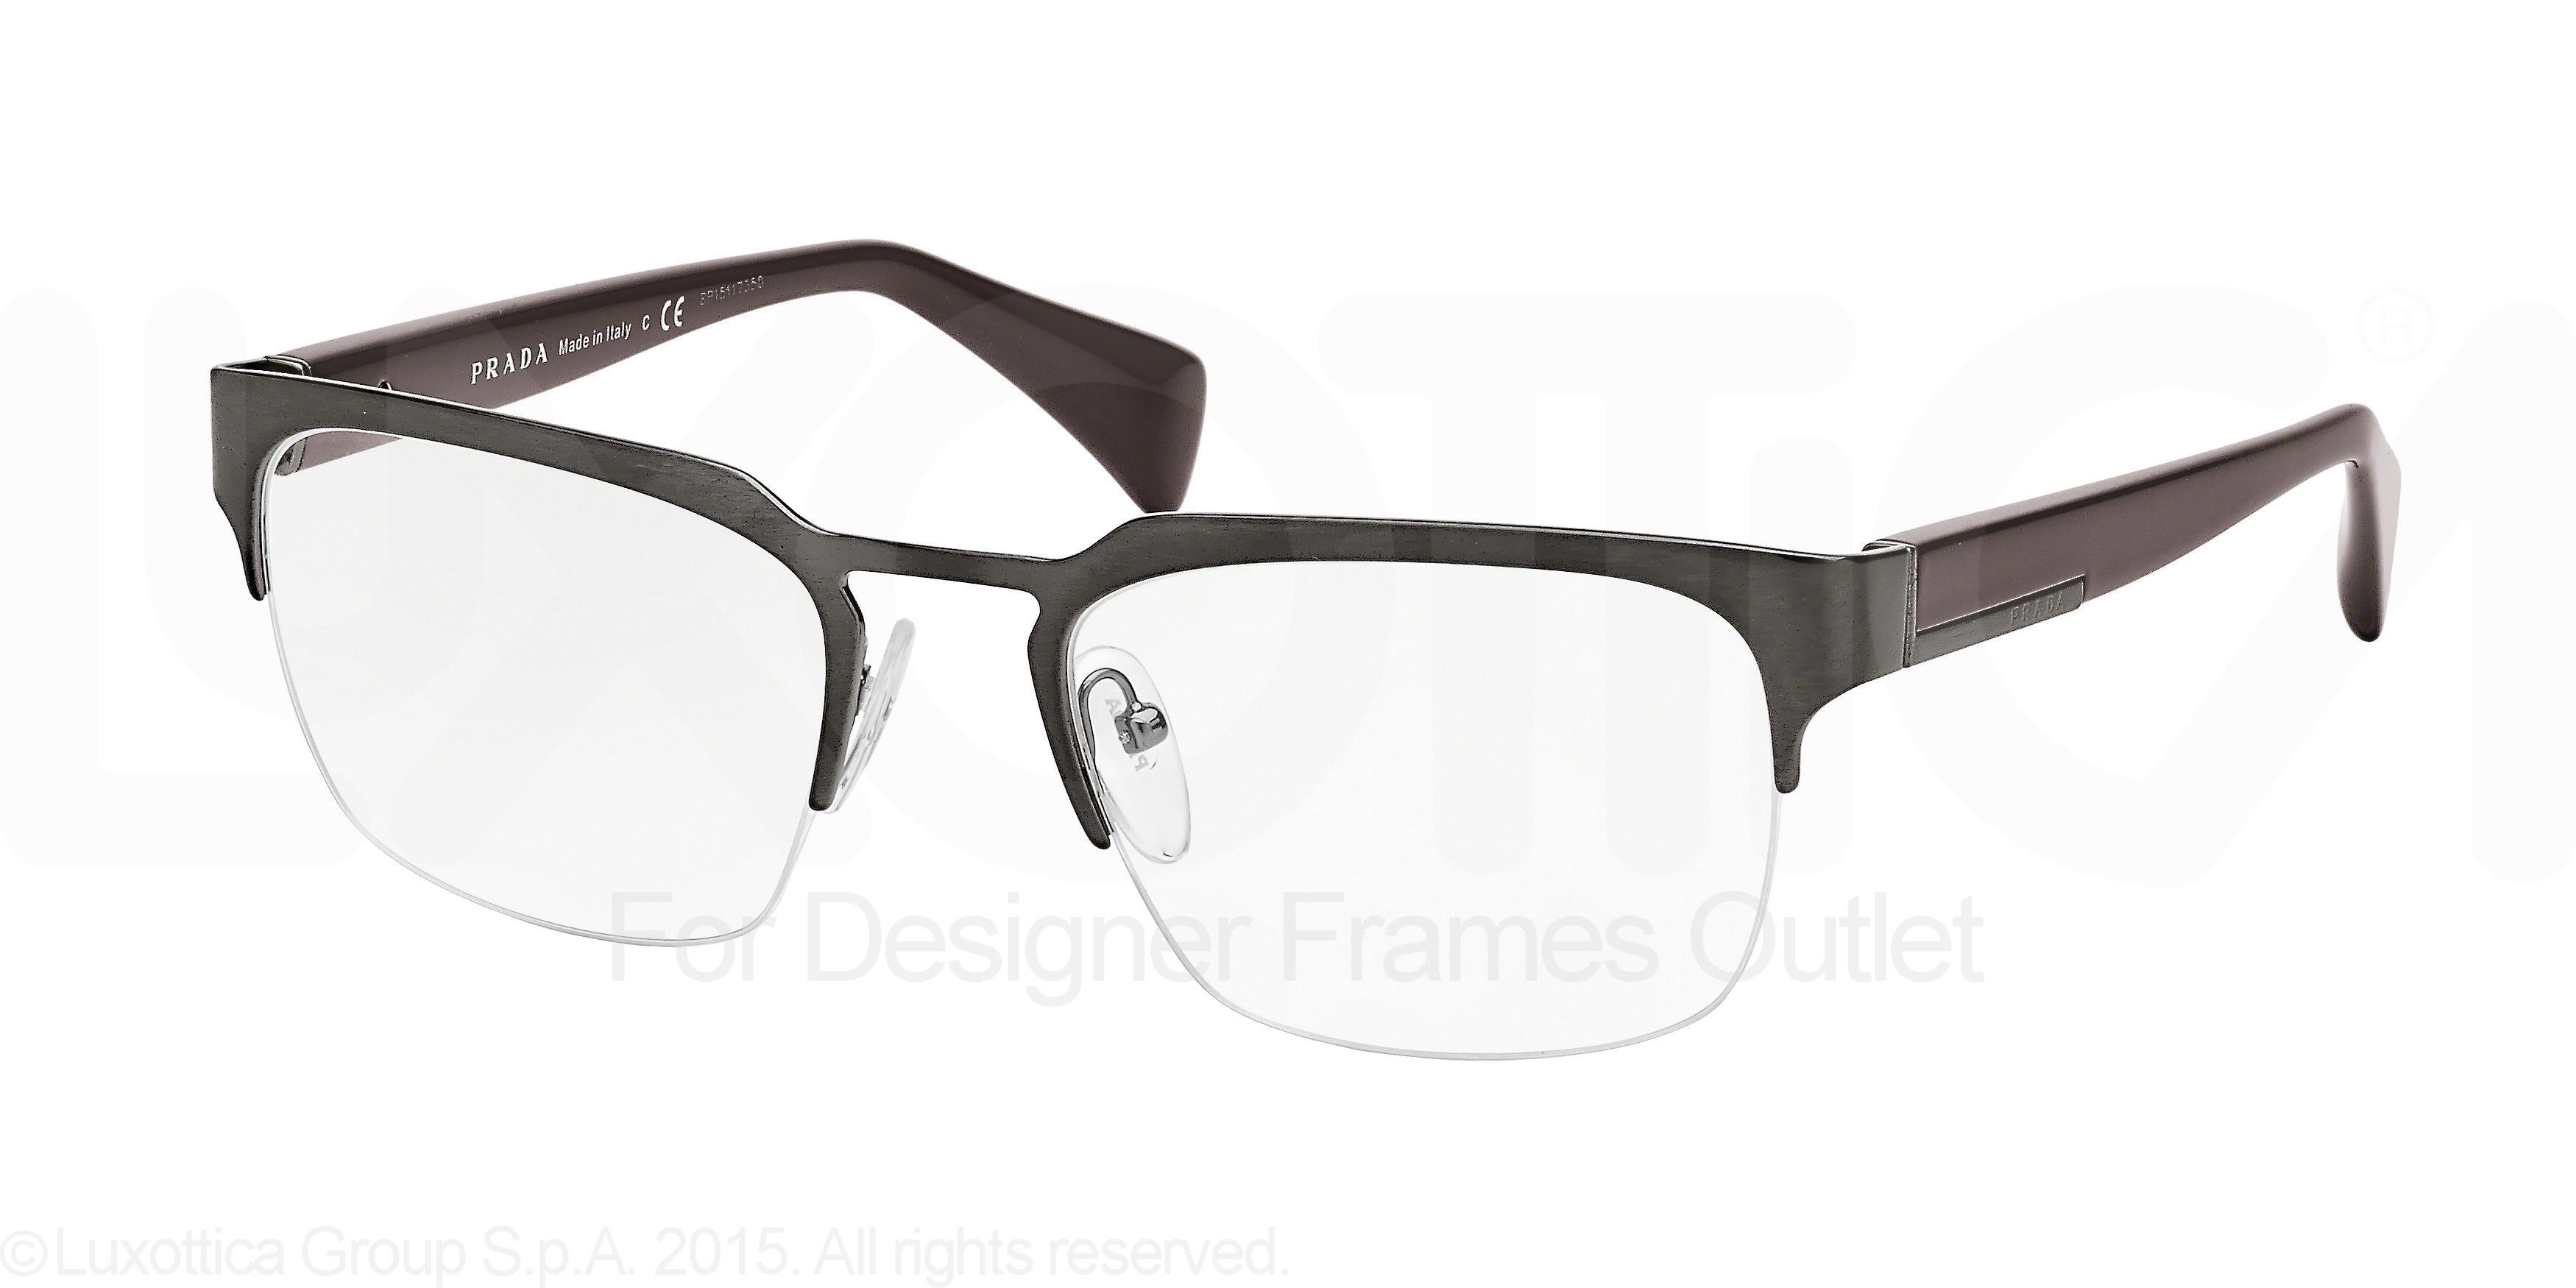 0f9a5f4eb46d Designer Frames Outlet. Prada PR66QV